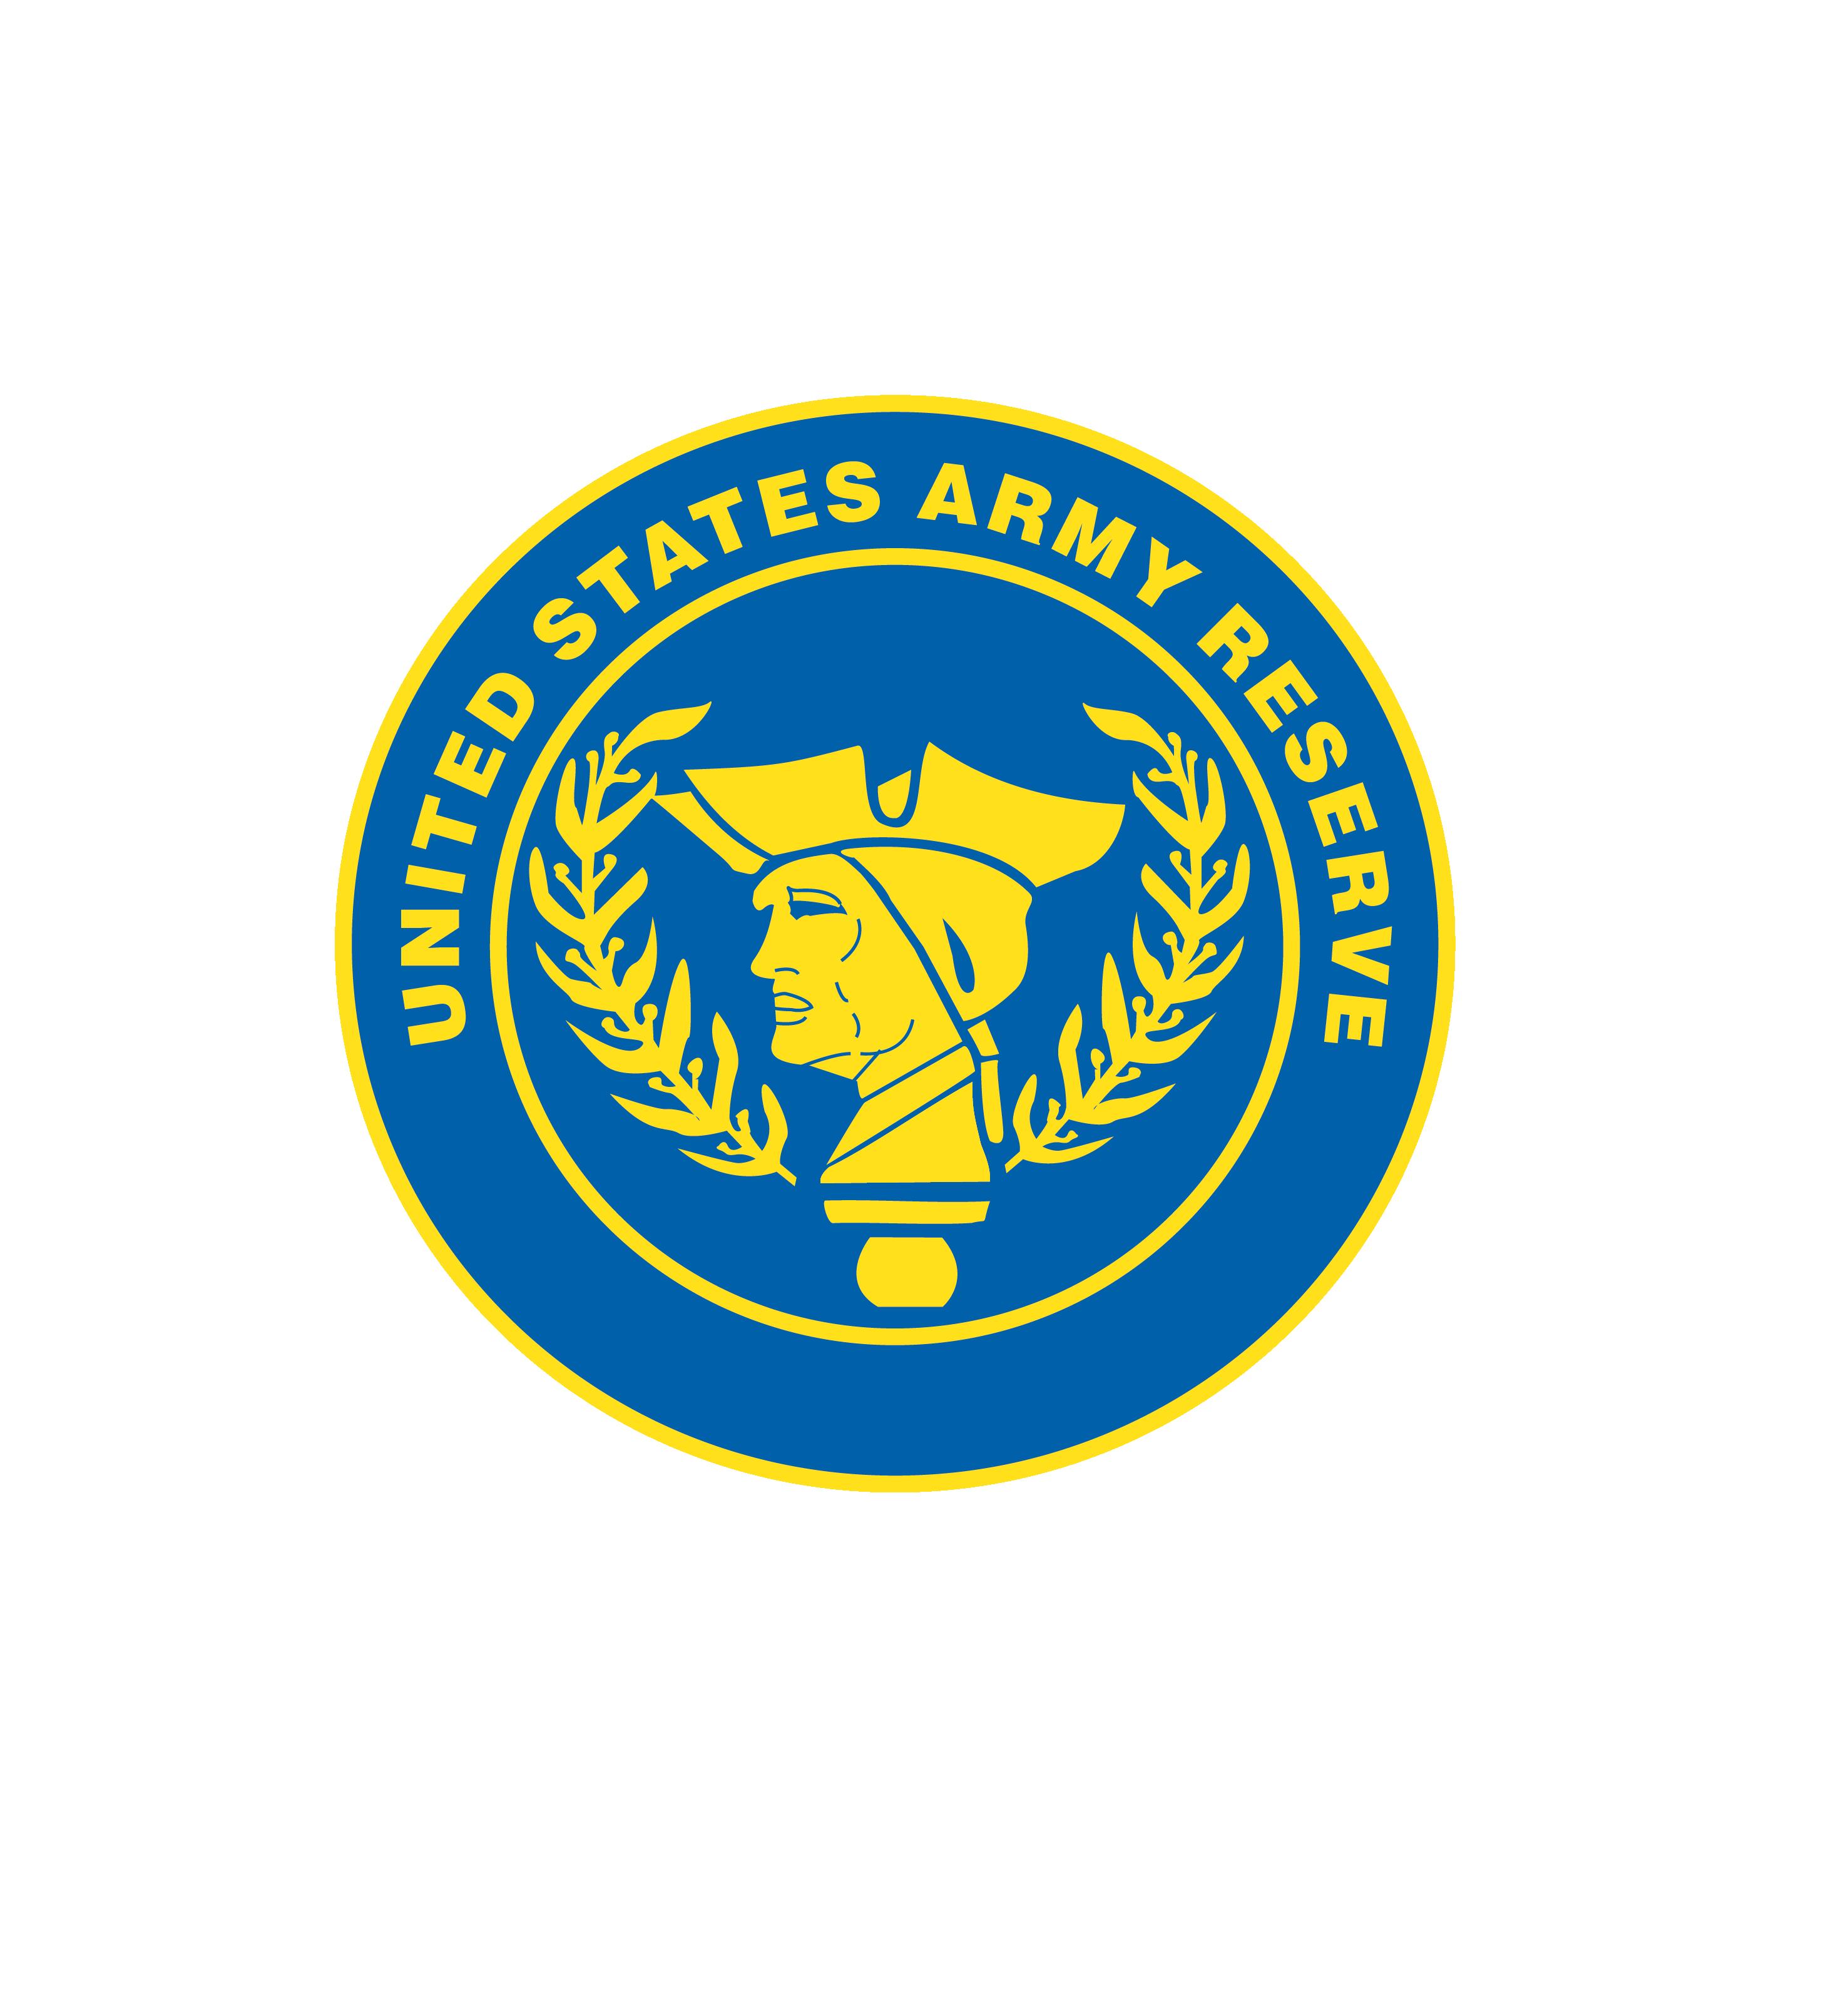 2953x3217 Dod Logos Us Army Mwr